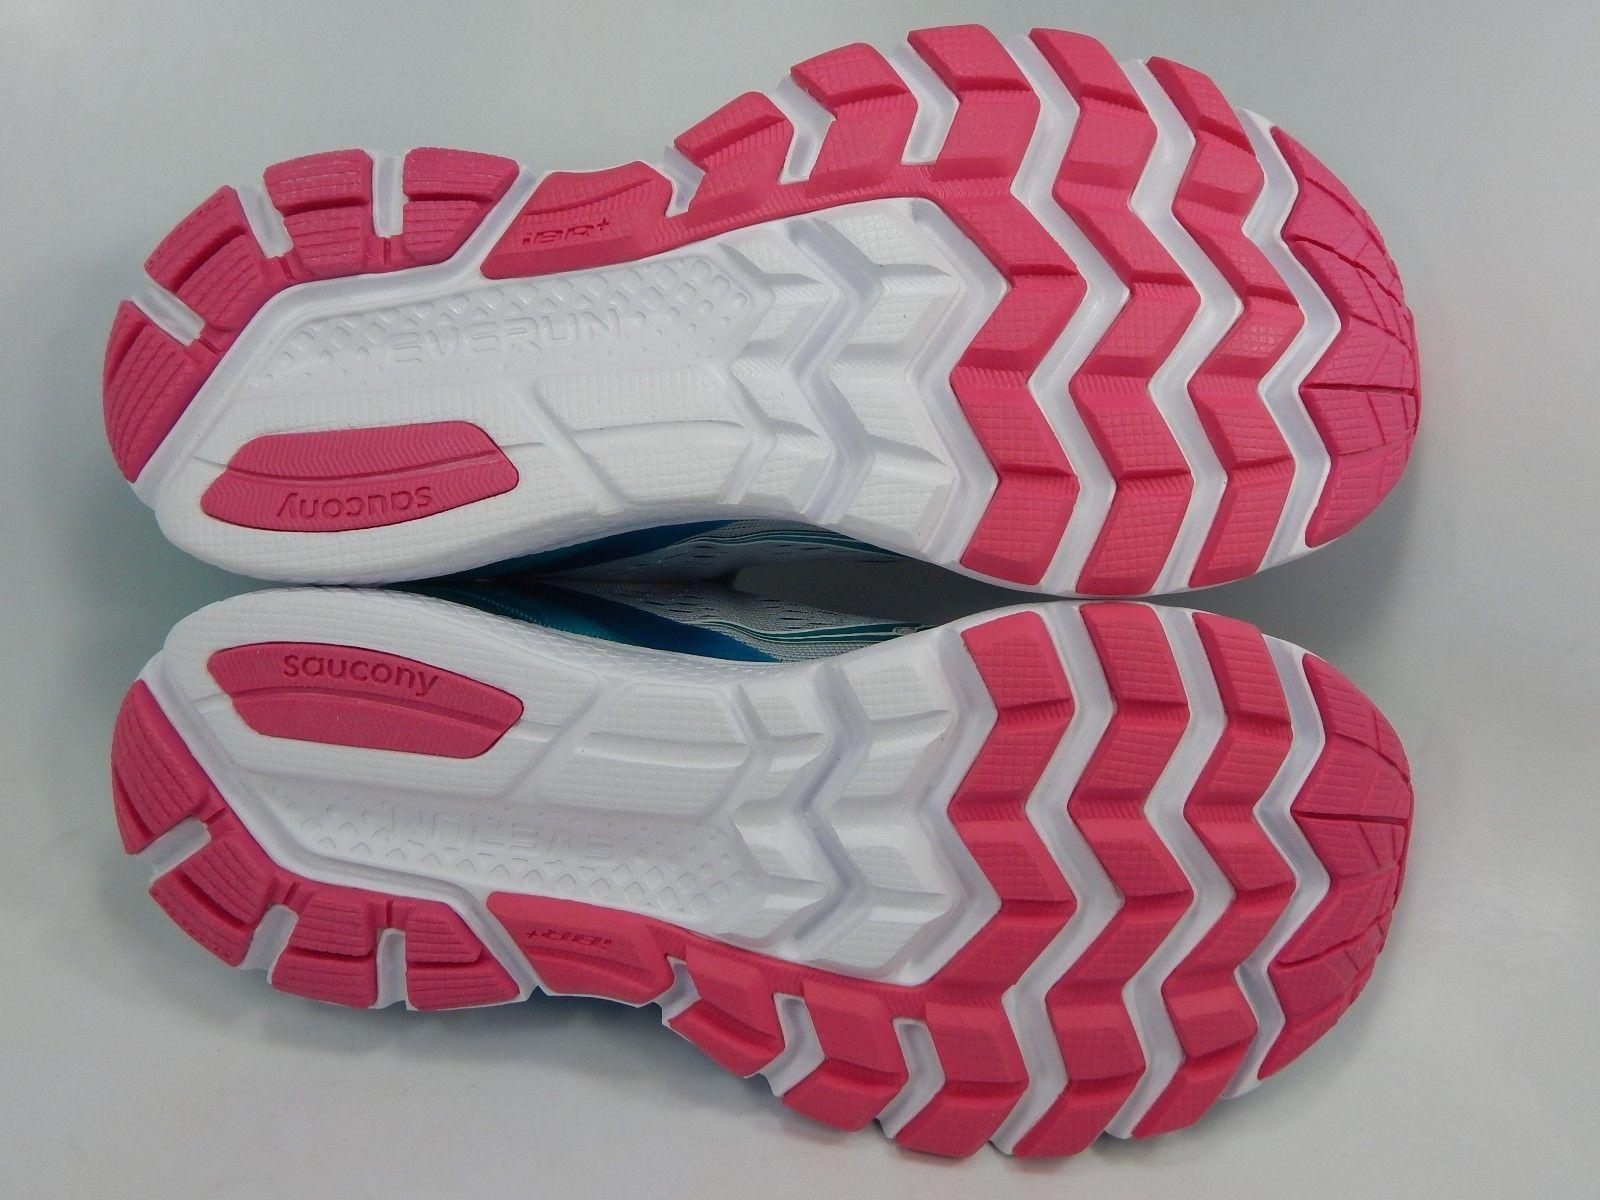 Saucony Zealot ISO 3 Women's Running Shoes Size US 8 M (B) EU 39 Grey S10369-1